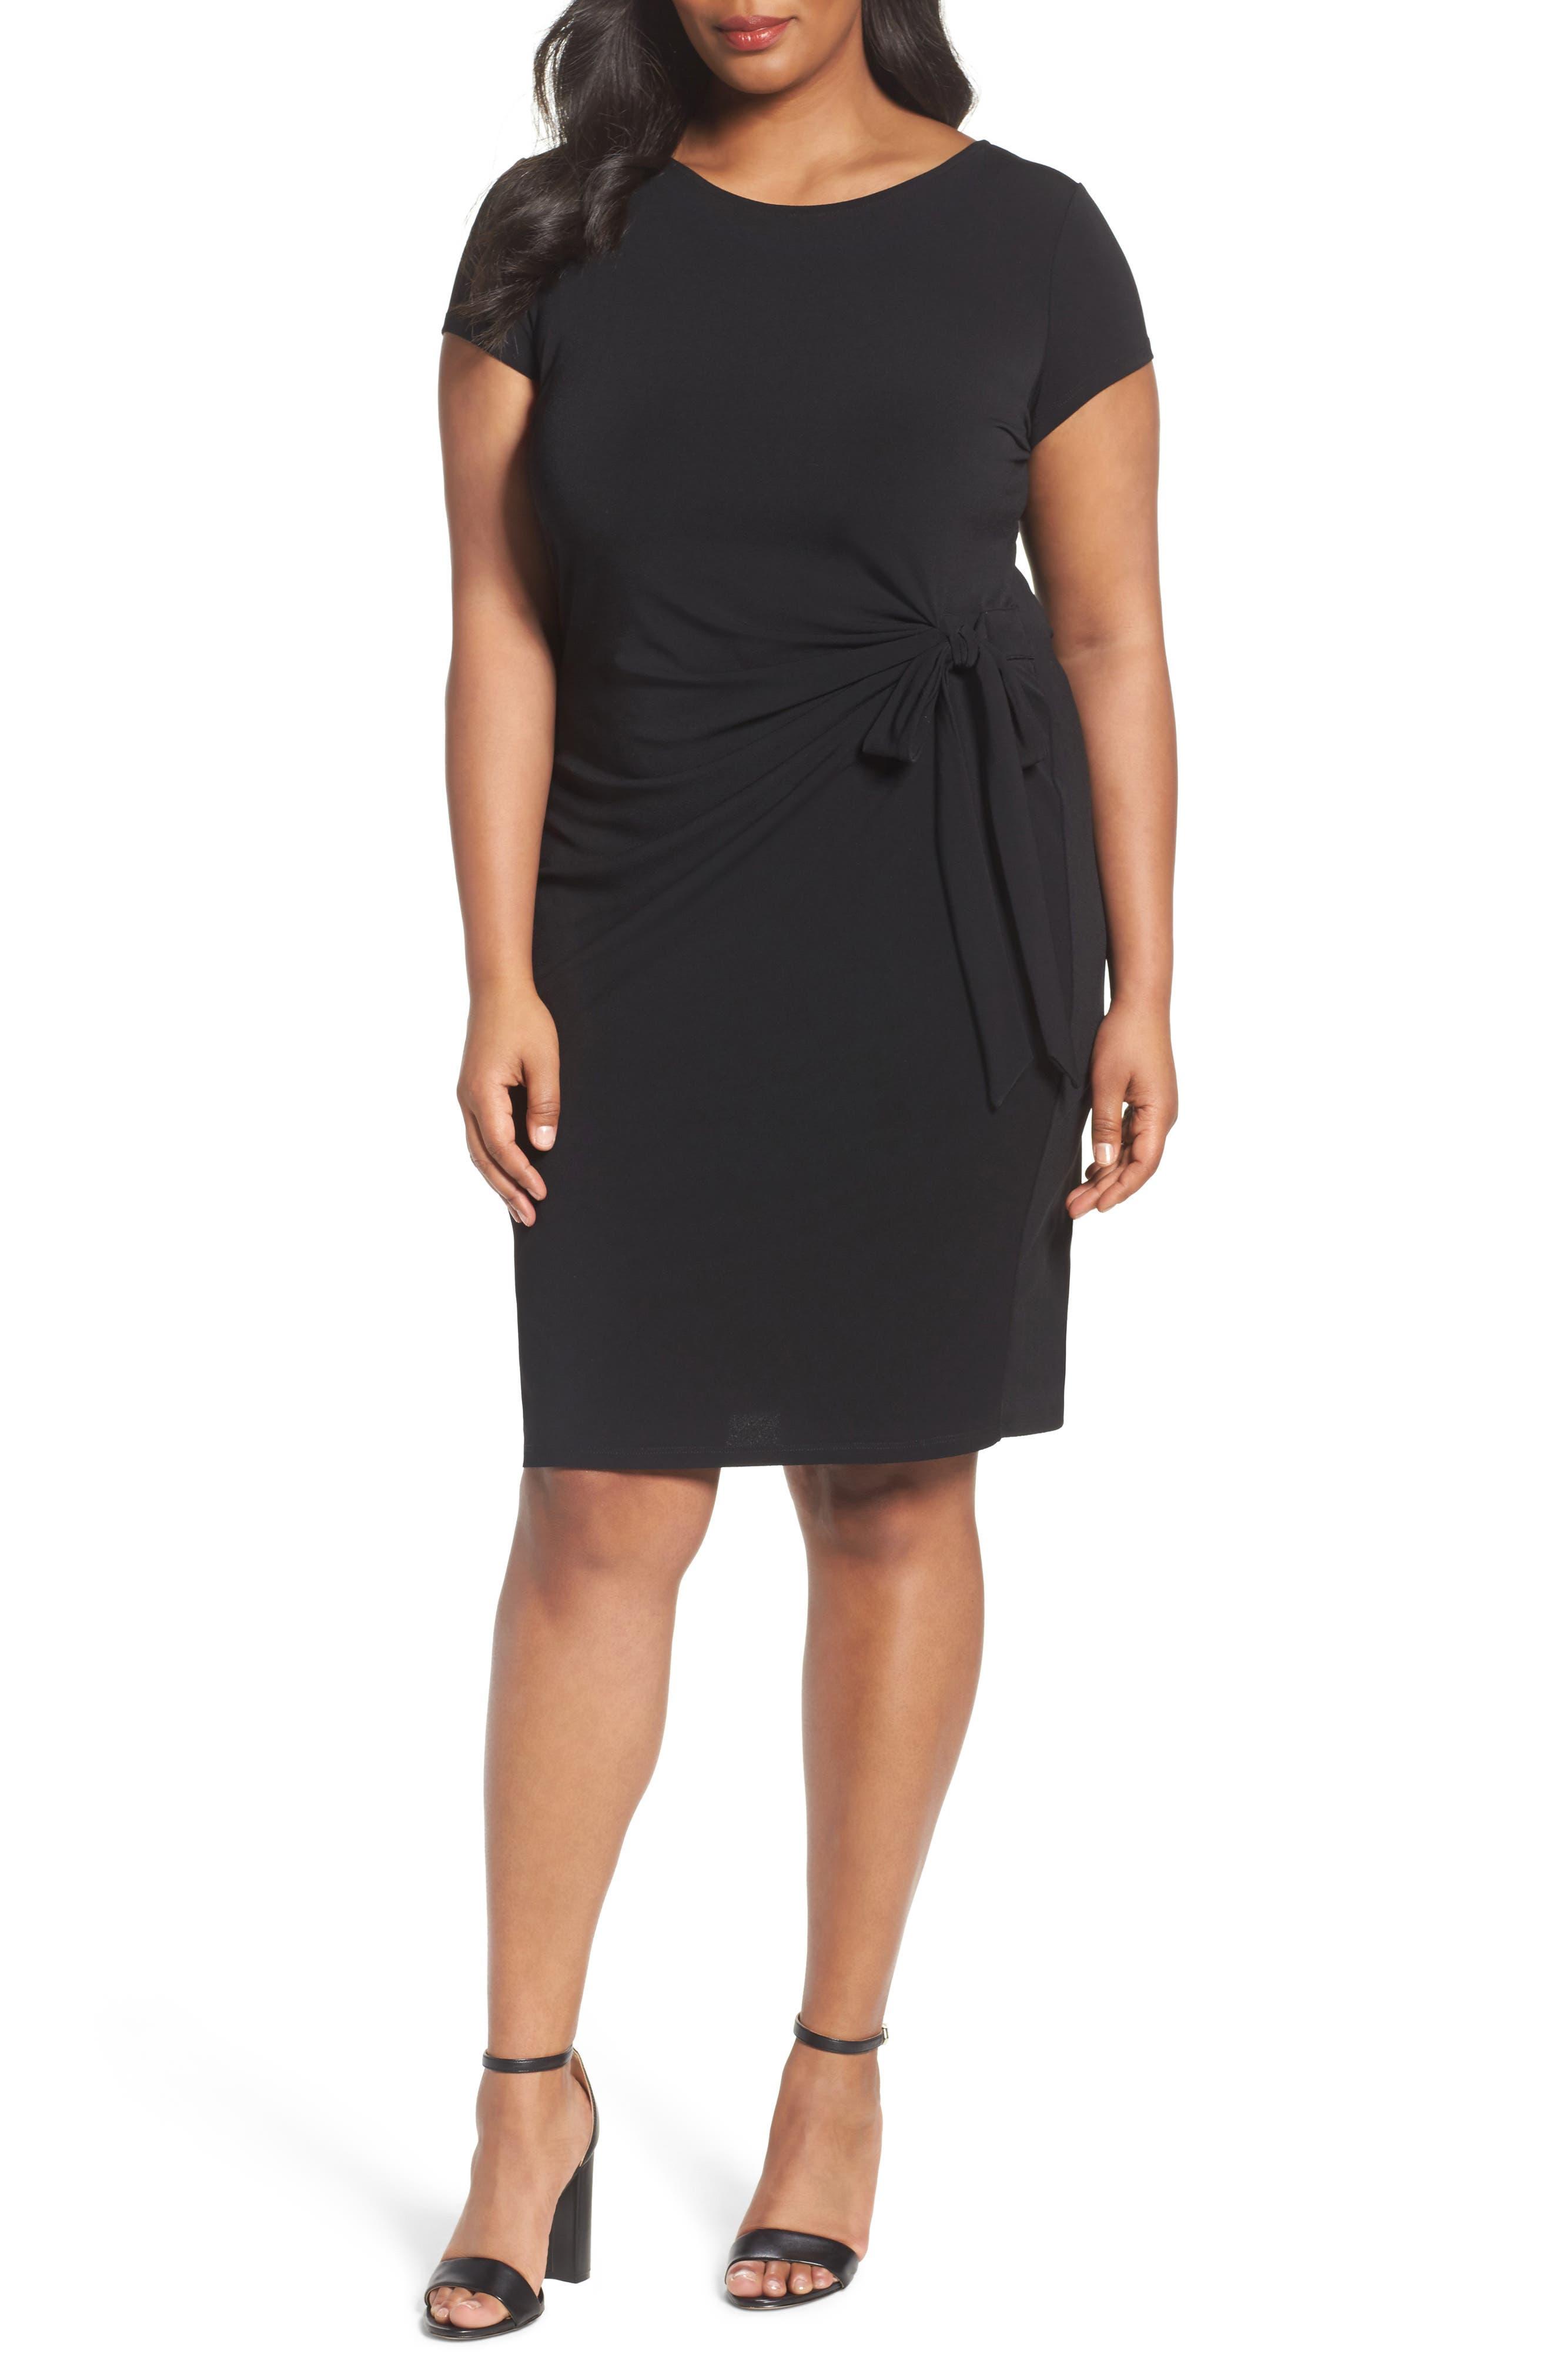 Leota Madison T-Shirt Dress (Plus Size)